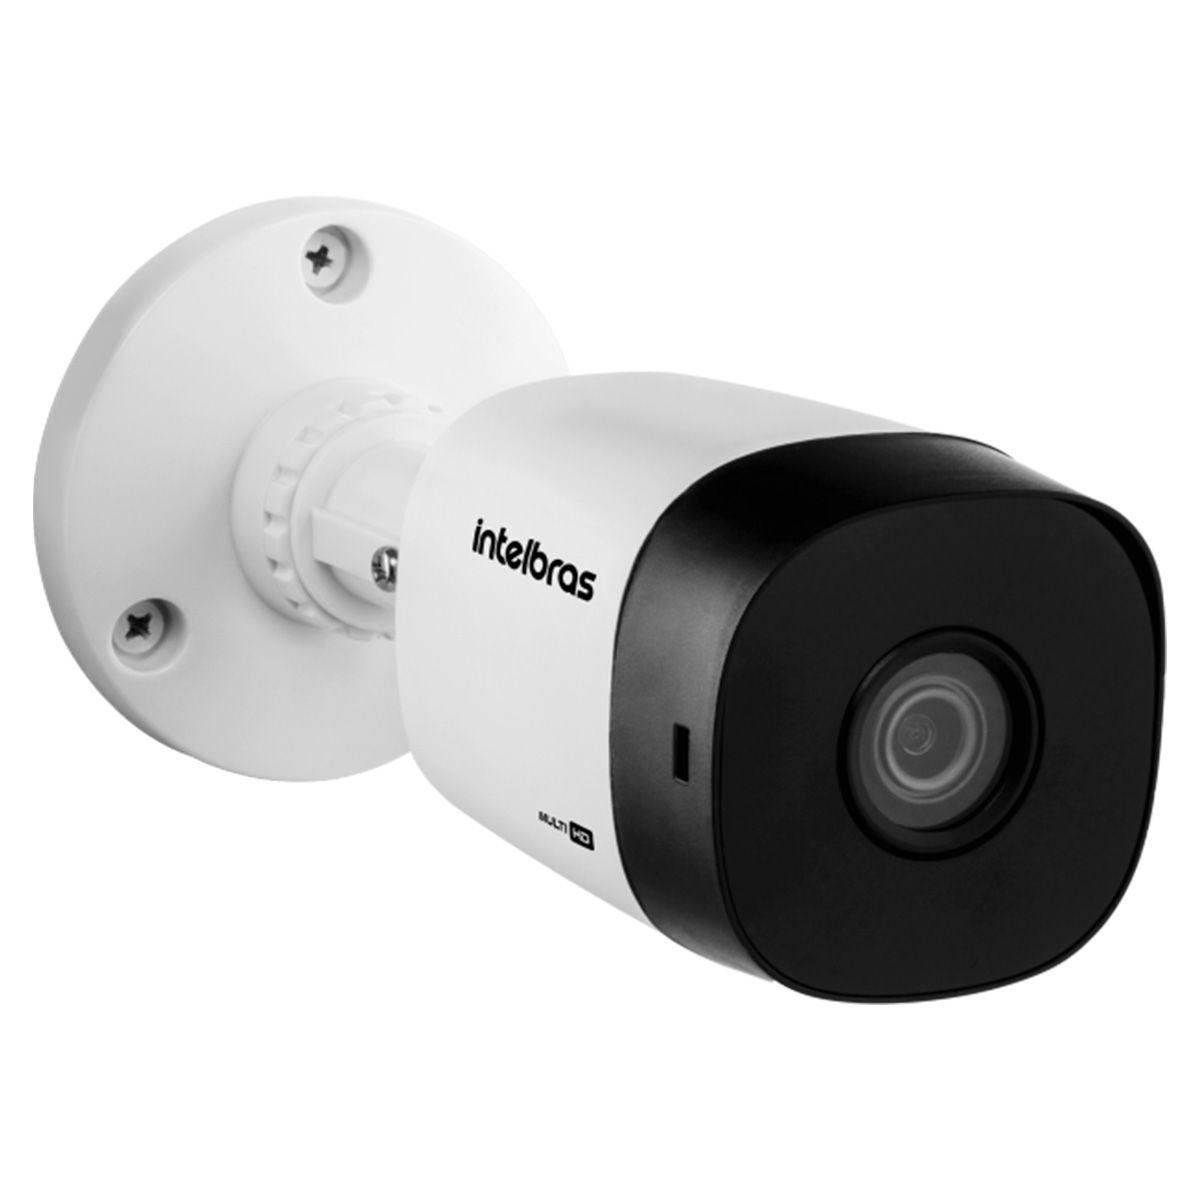 Kit 4 Câmeras de Segurança Intelbras Hdcvi Vhd 1120B G5 Lente 3.6mm 20 M